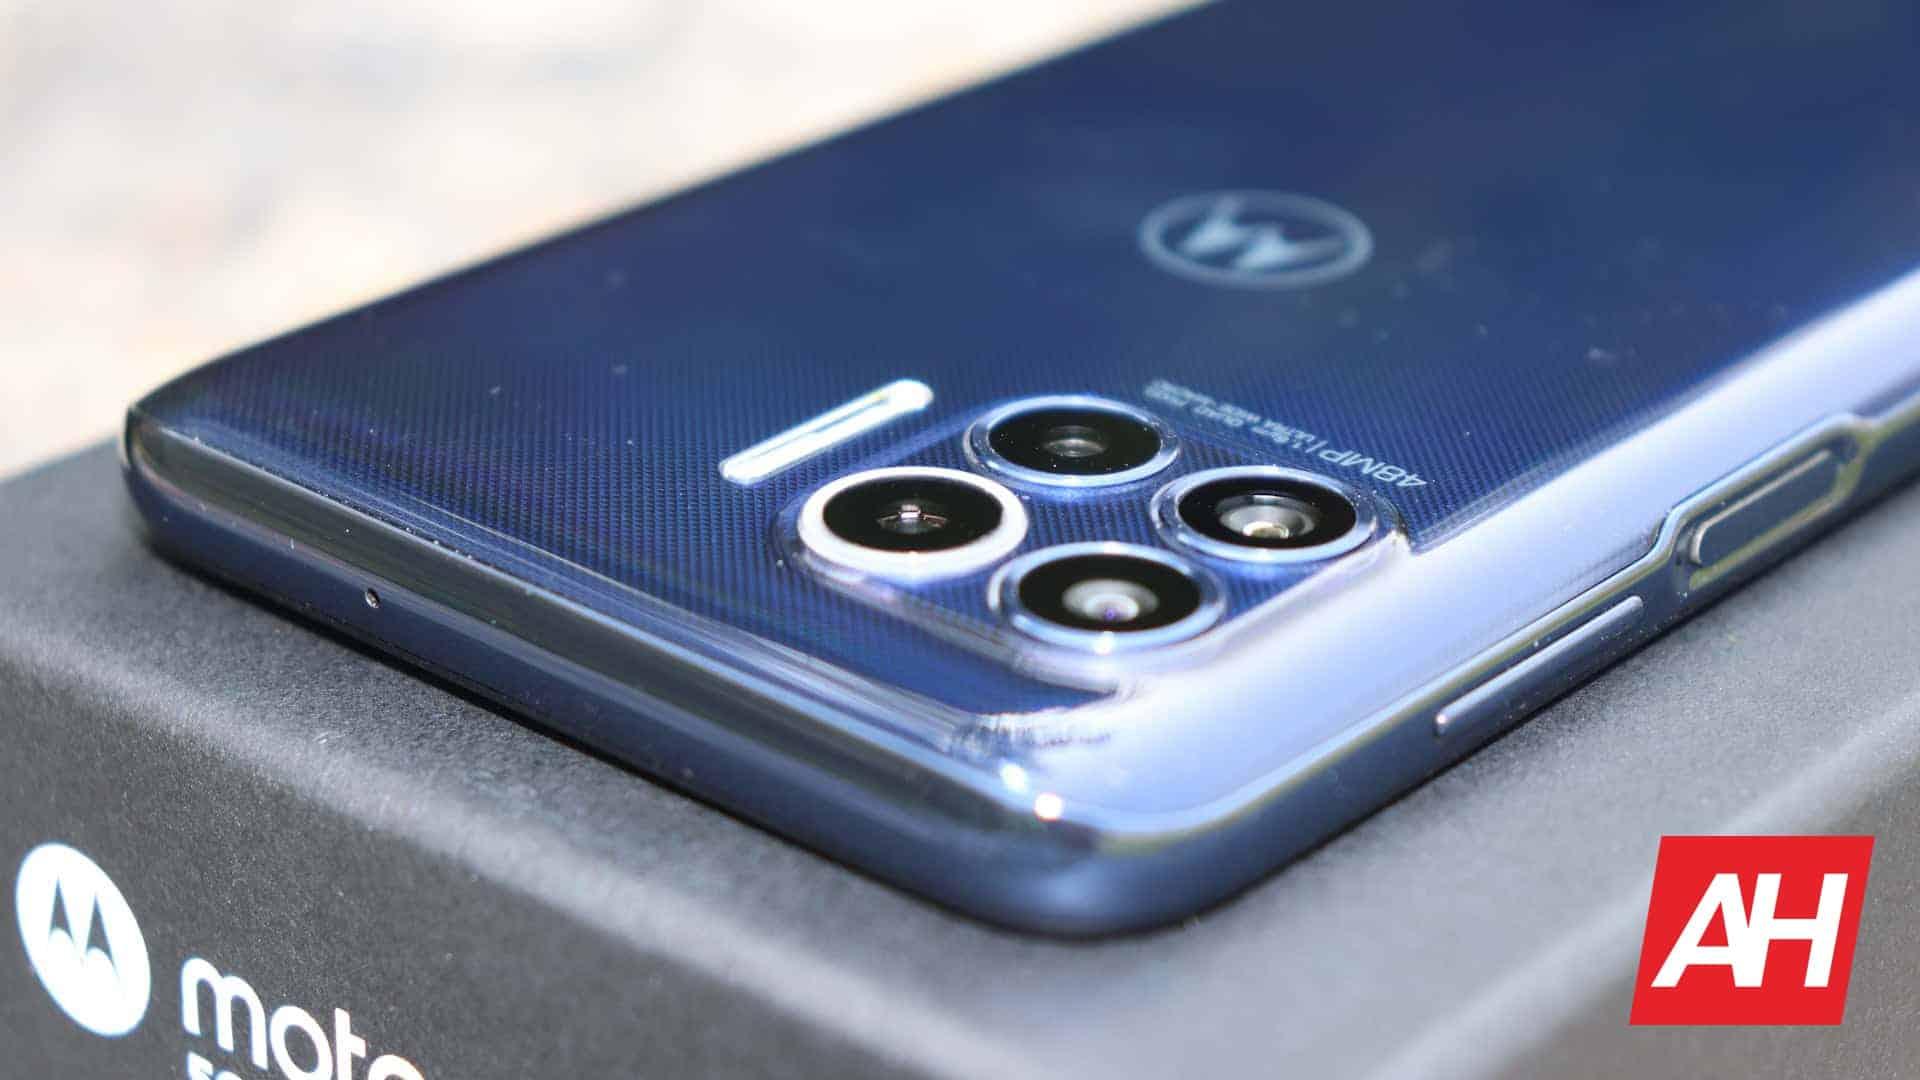 01 4 Motorola One 5G review AH 2020